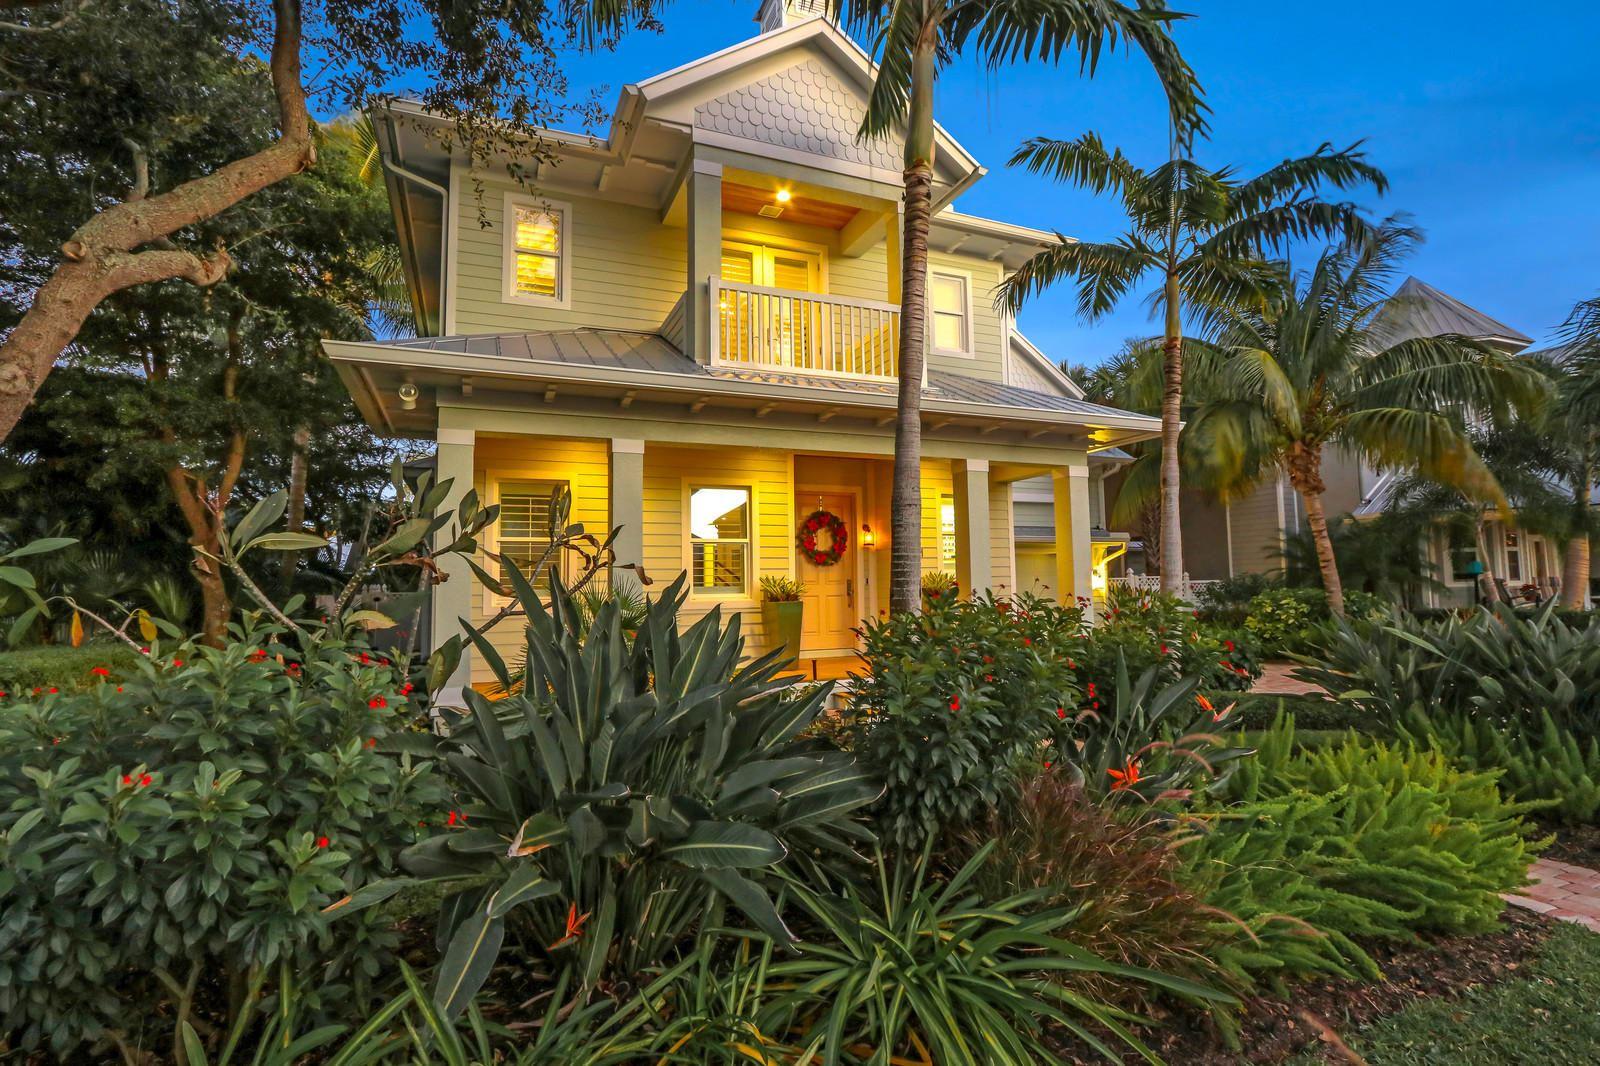 71 SE River Lights Court, Stuart, FL 34996 - #: RX-10600021